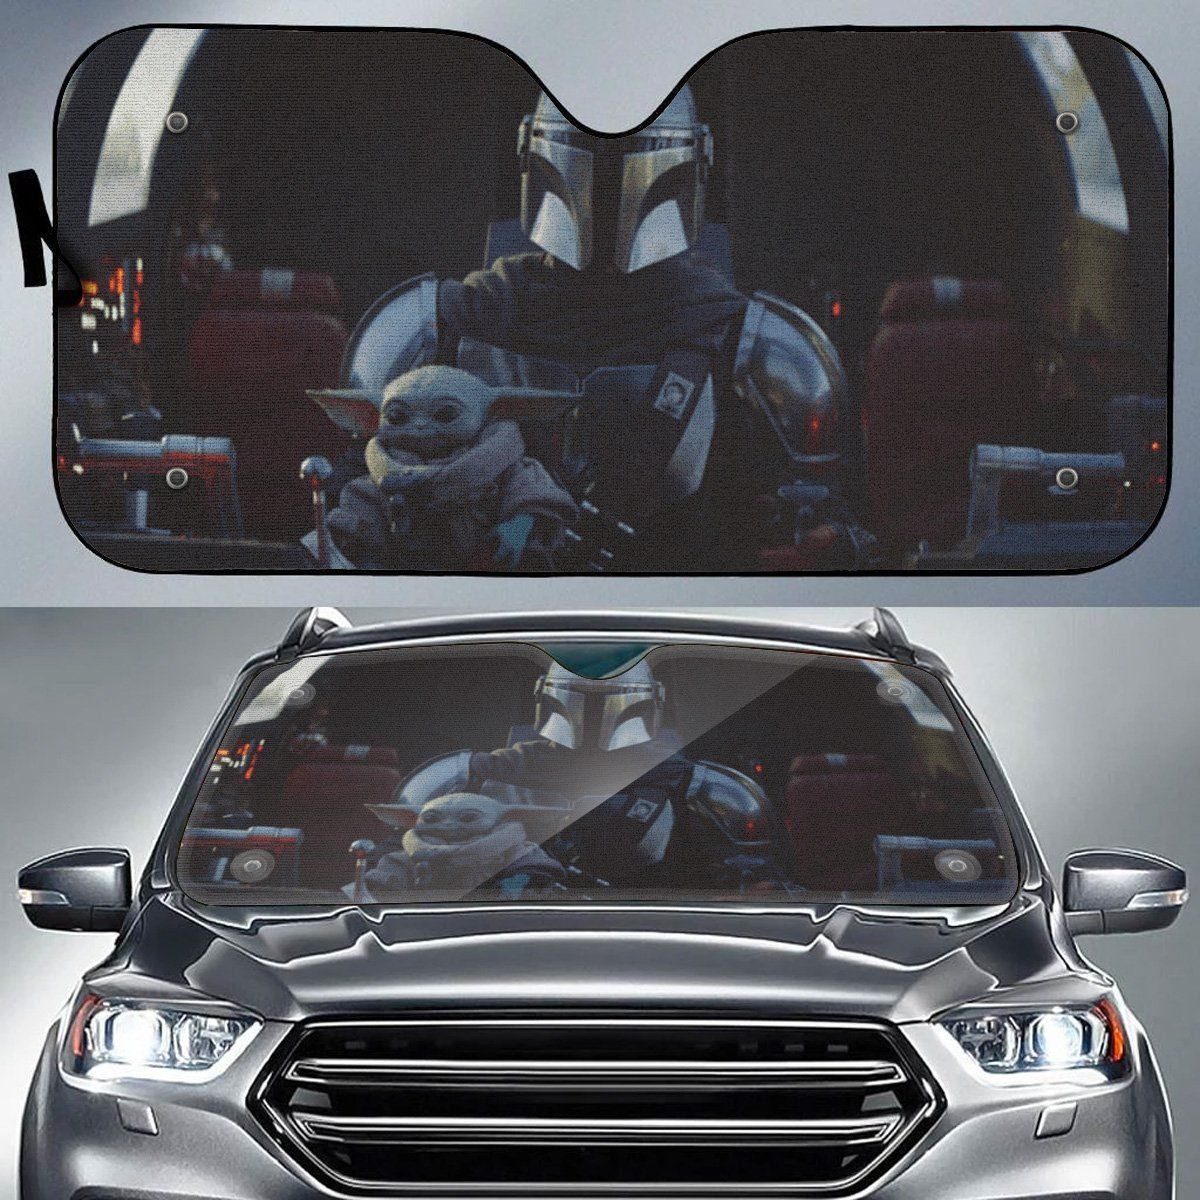 2 Side Window Shades Black Motor Trend Reversible Accordian Car Sun Reflector